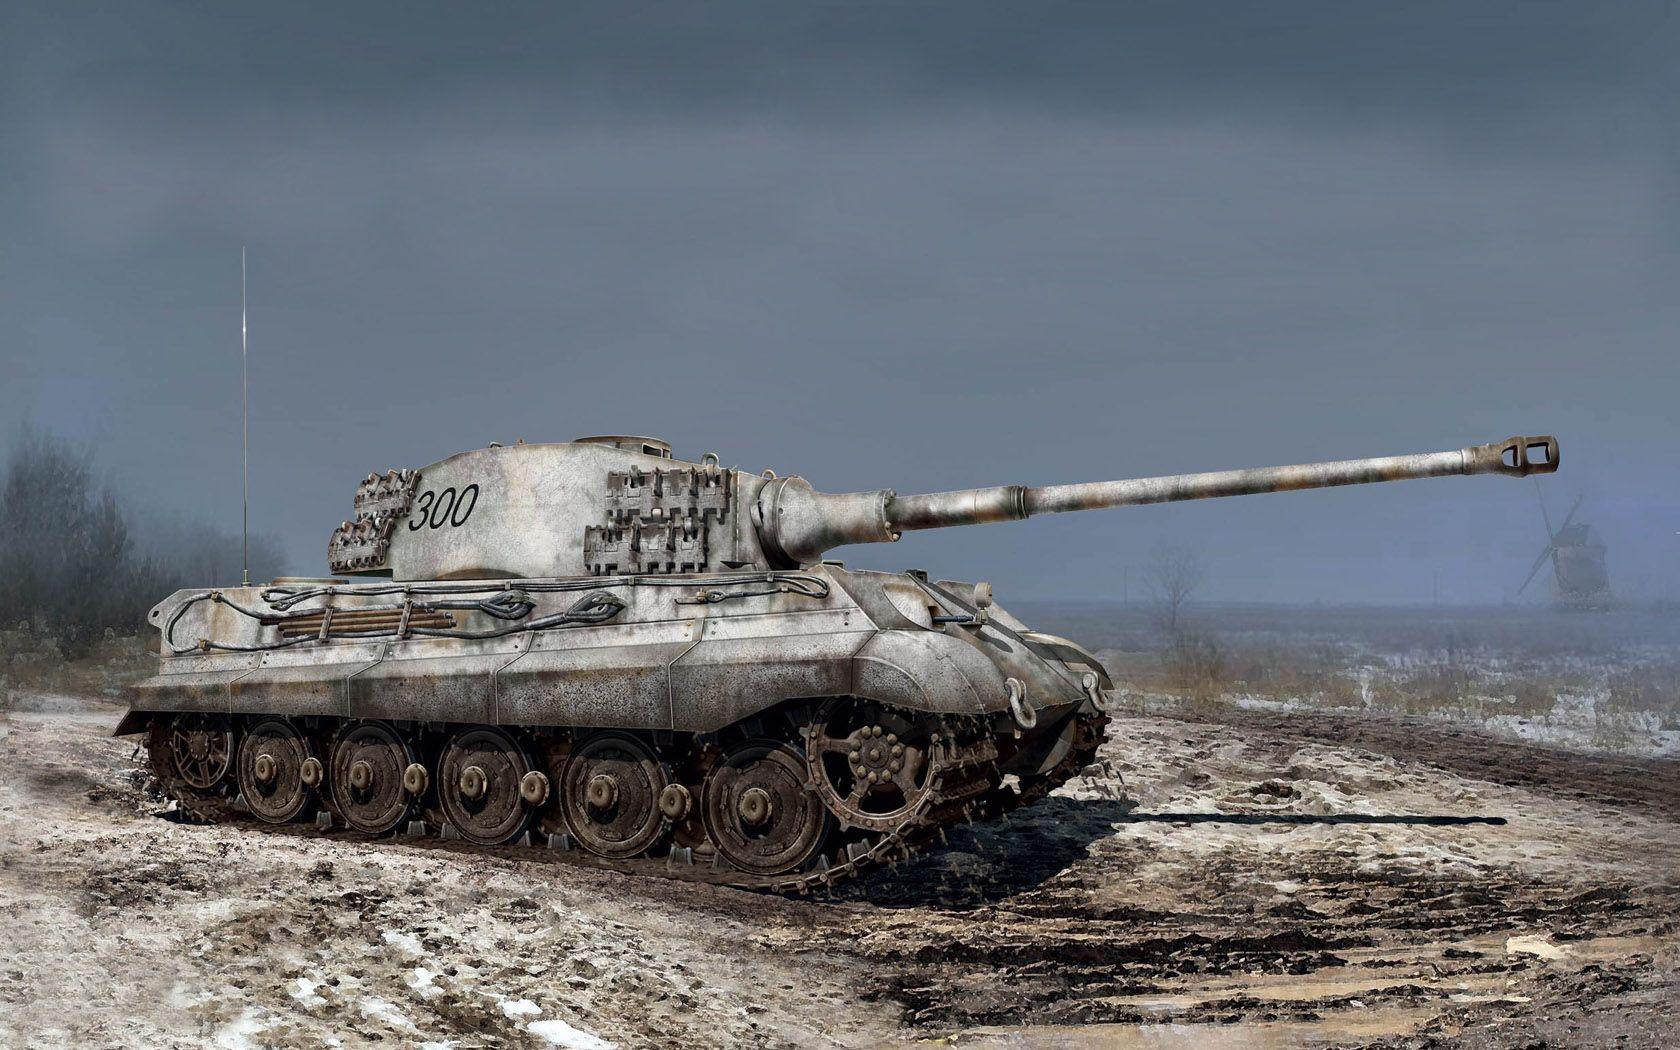 Pz.Kpfw.VI Ausf. B Königstiger, cortesía de ICM. http://www.elgrancapitan.org/foro/viewtopic.php?f=12&t=17519&p=887328#p887268